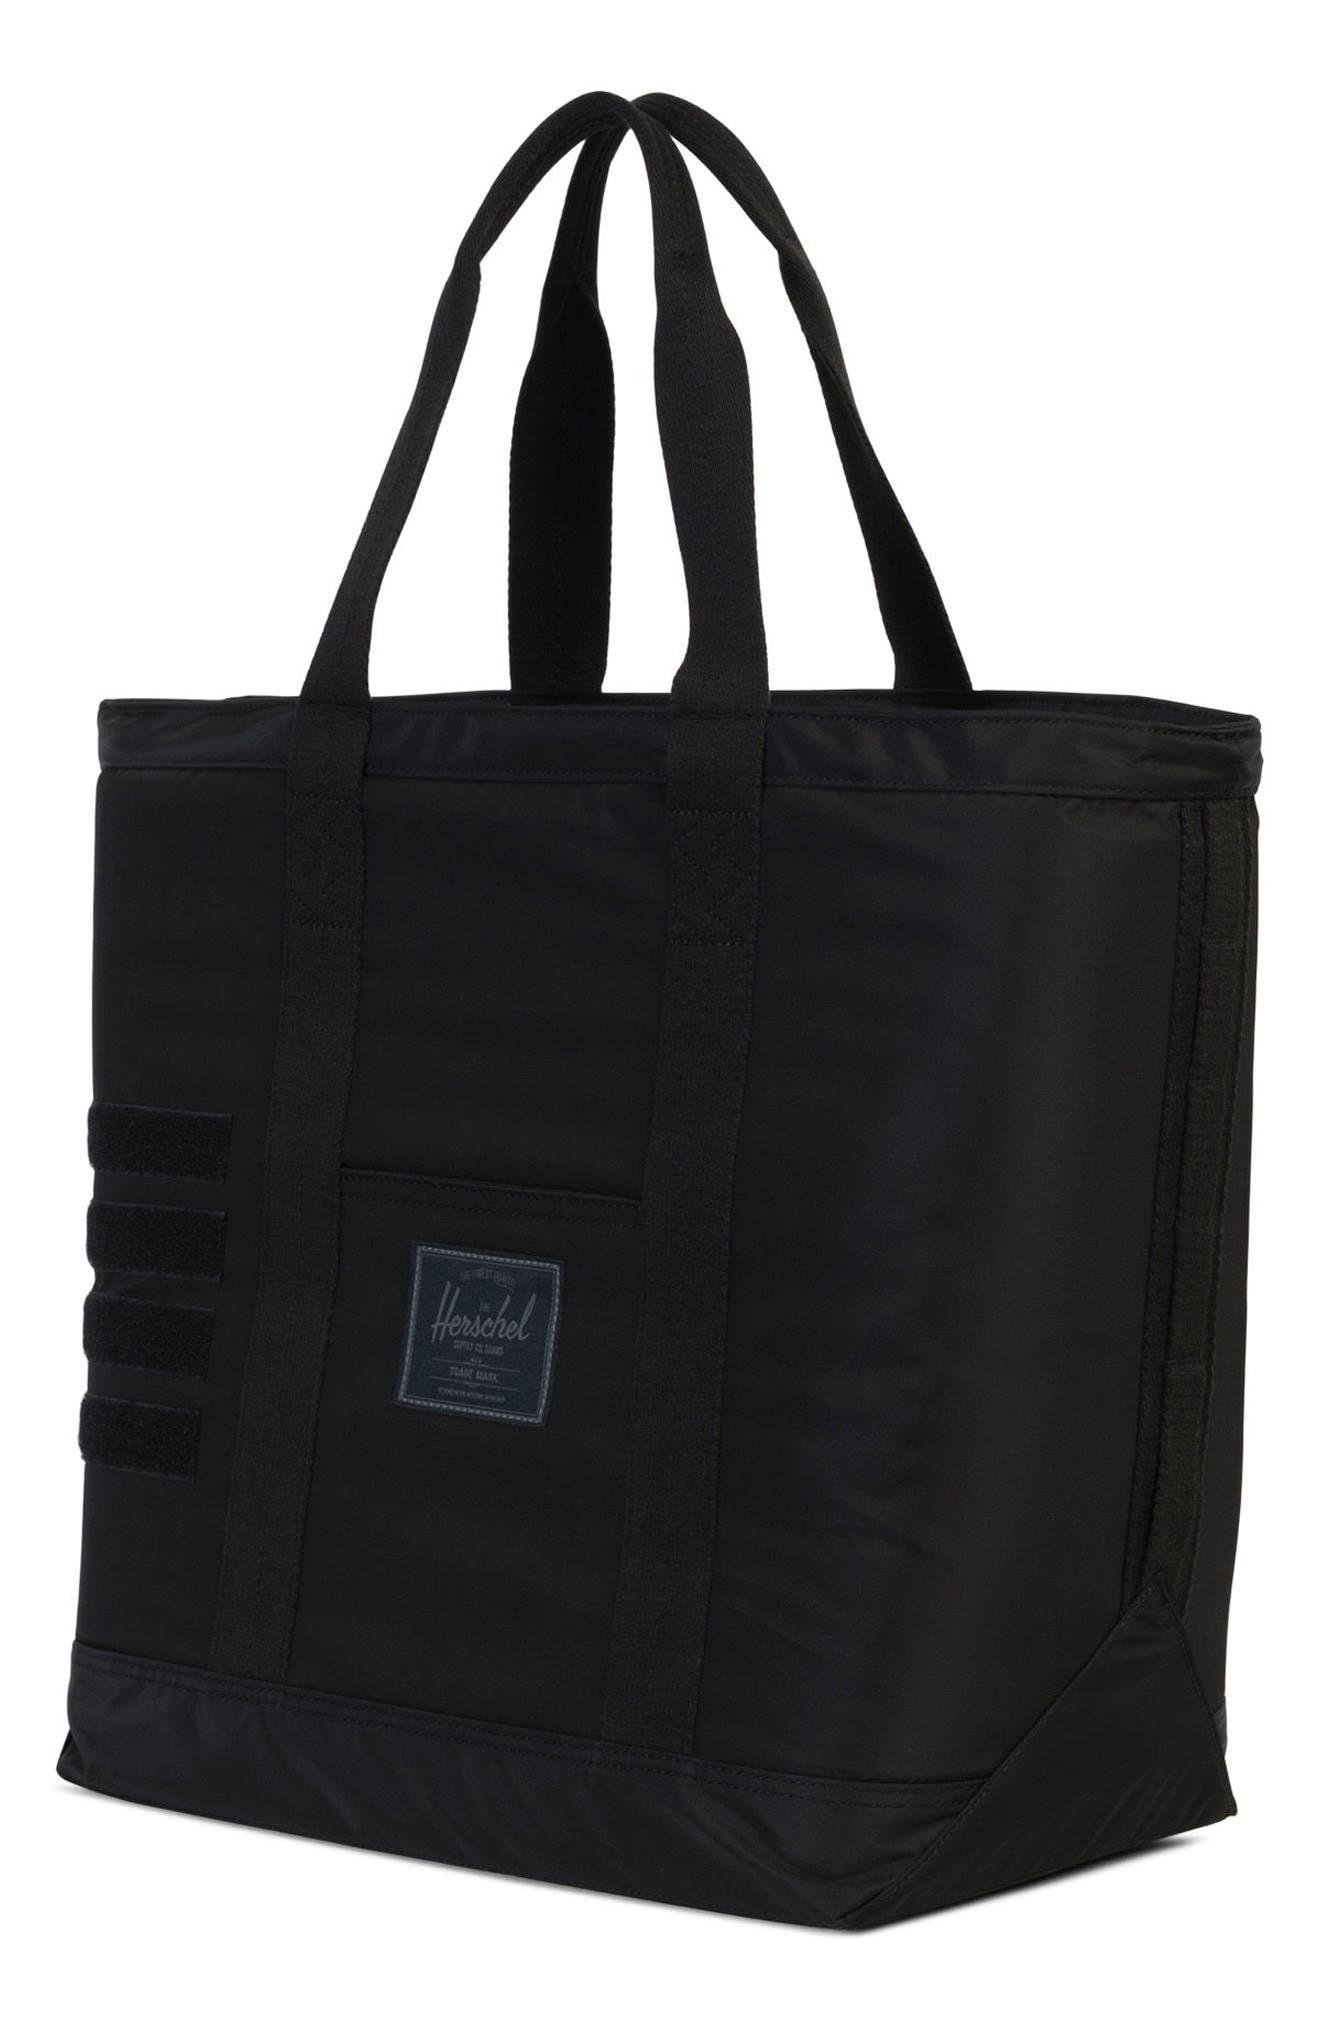 Bamfield Surplus Collection Tote Bag,                             Alternate thumbnail 2, color,                             Black